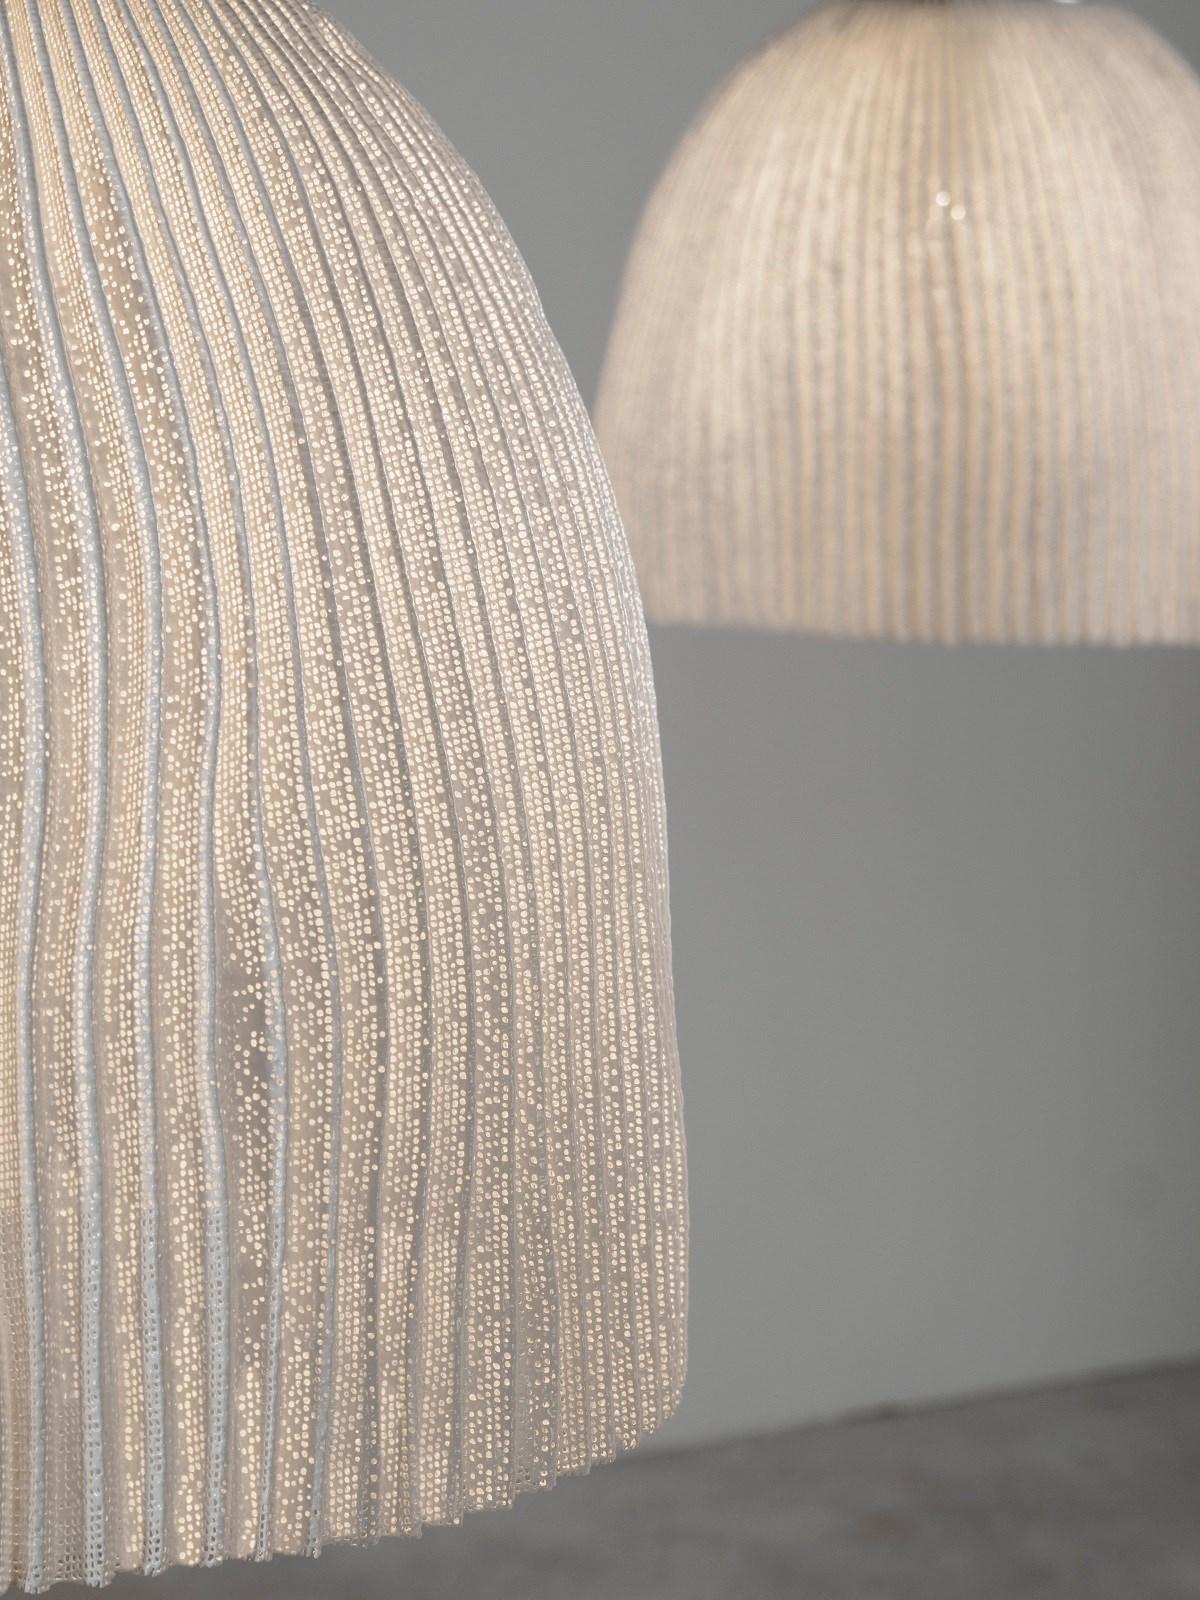 Arturo-Alvarez-Onn-Pendant-Lamp-Matisse-3